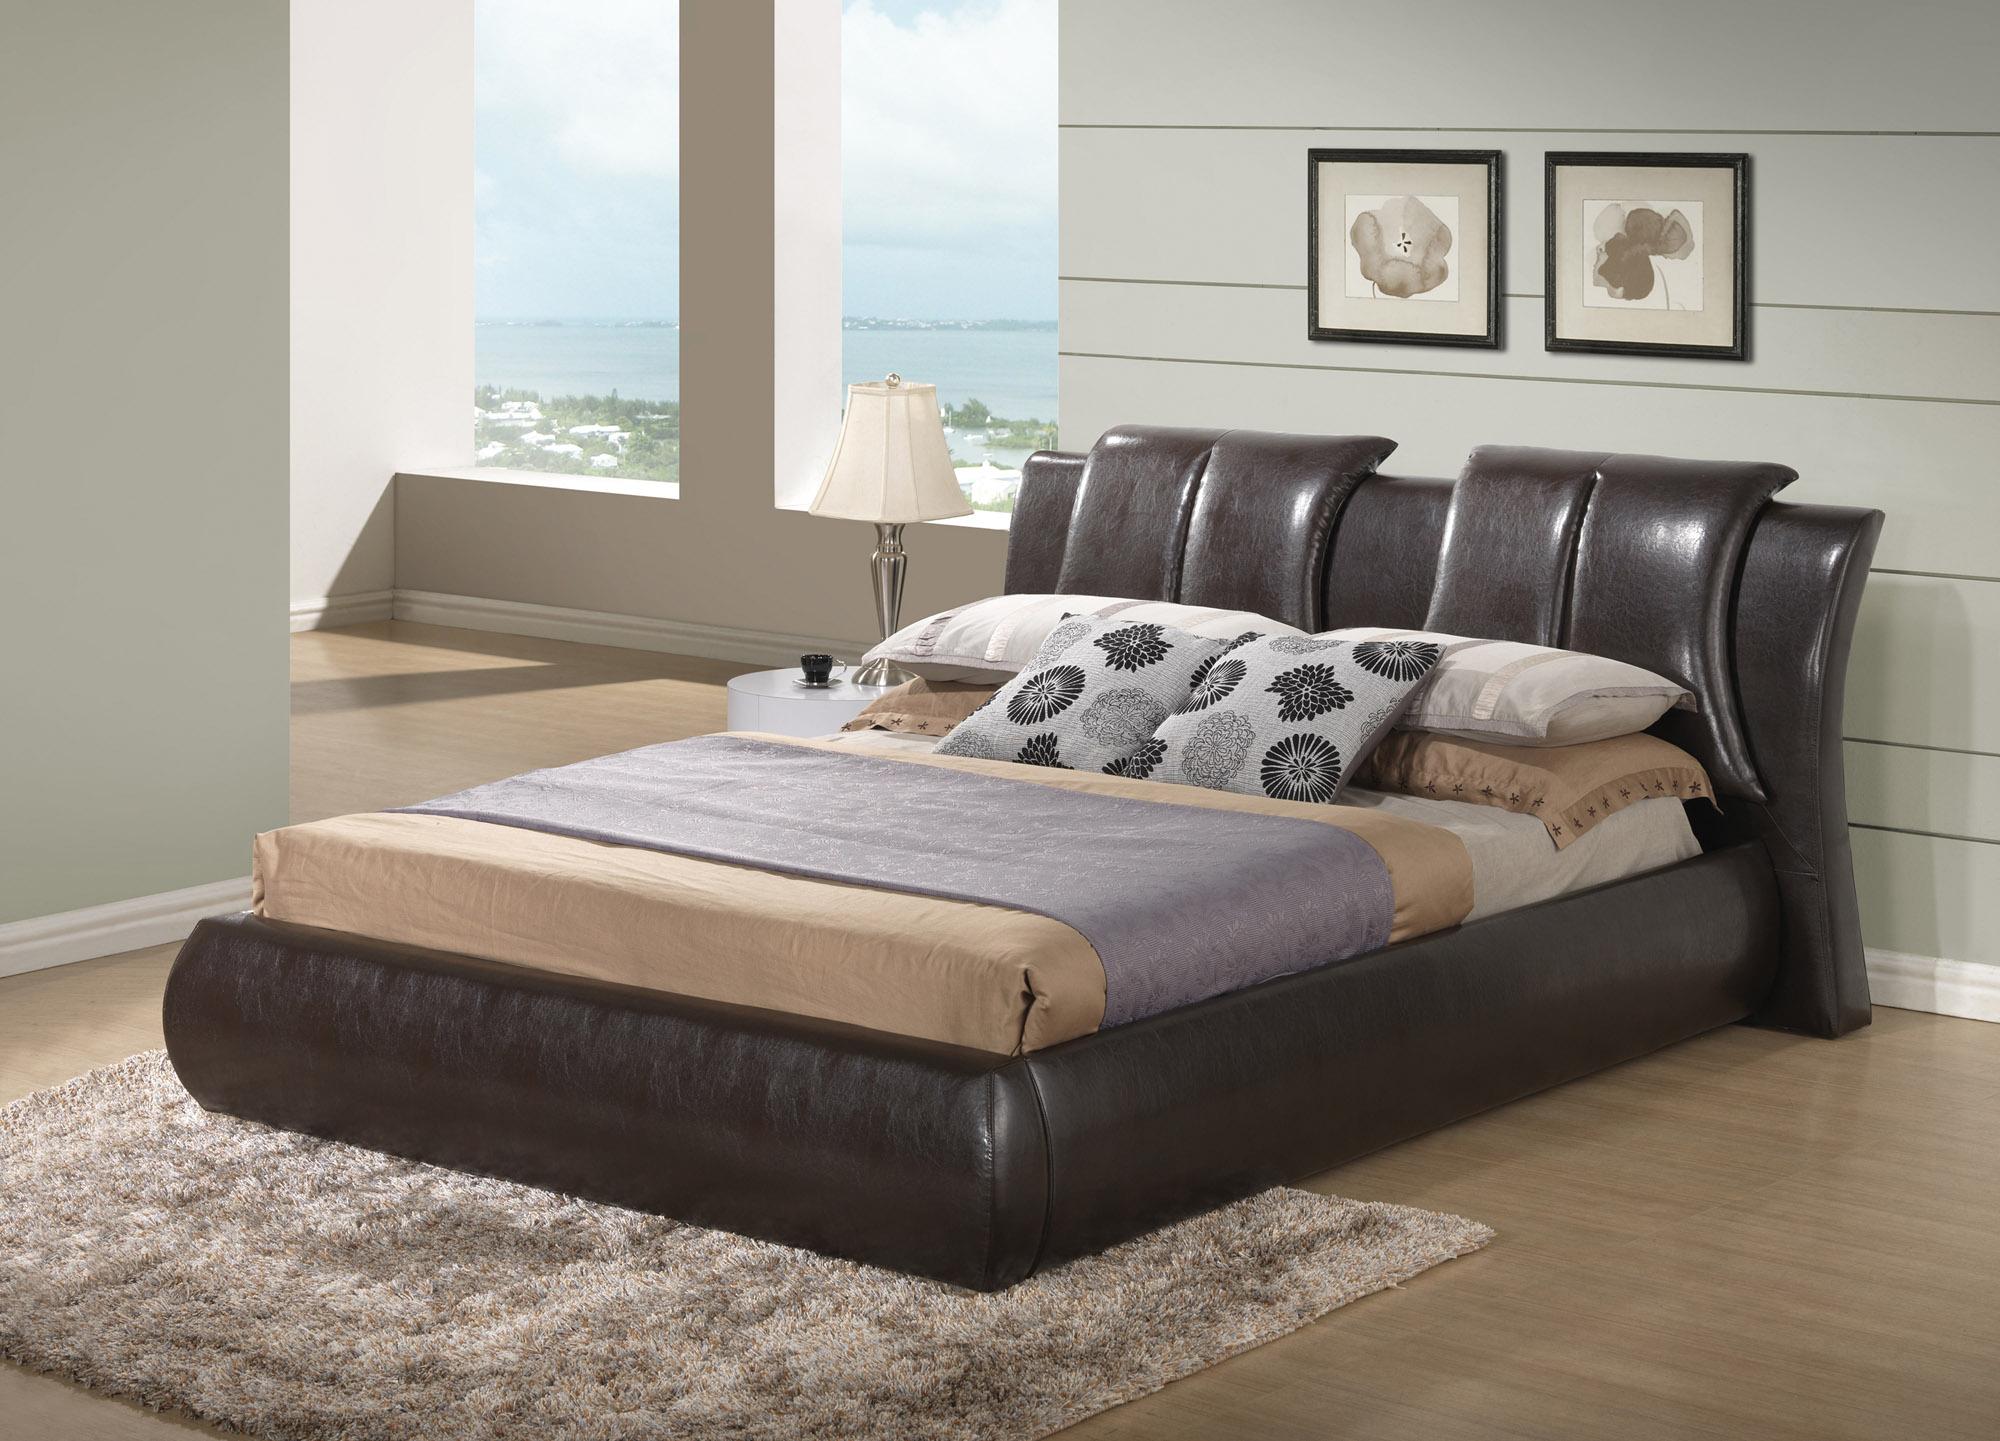 High class Leather Luxury Platform Bed New York New York GF8269